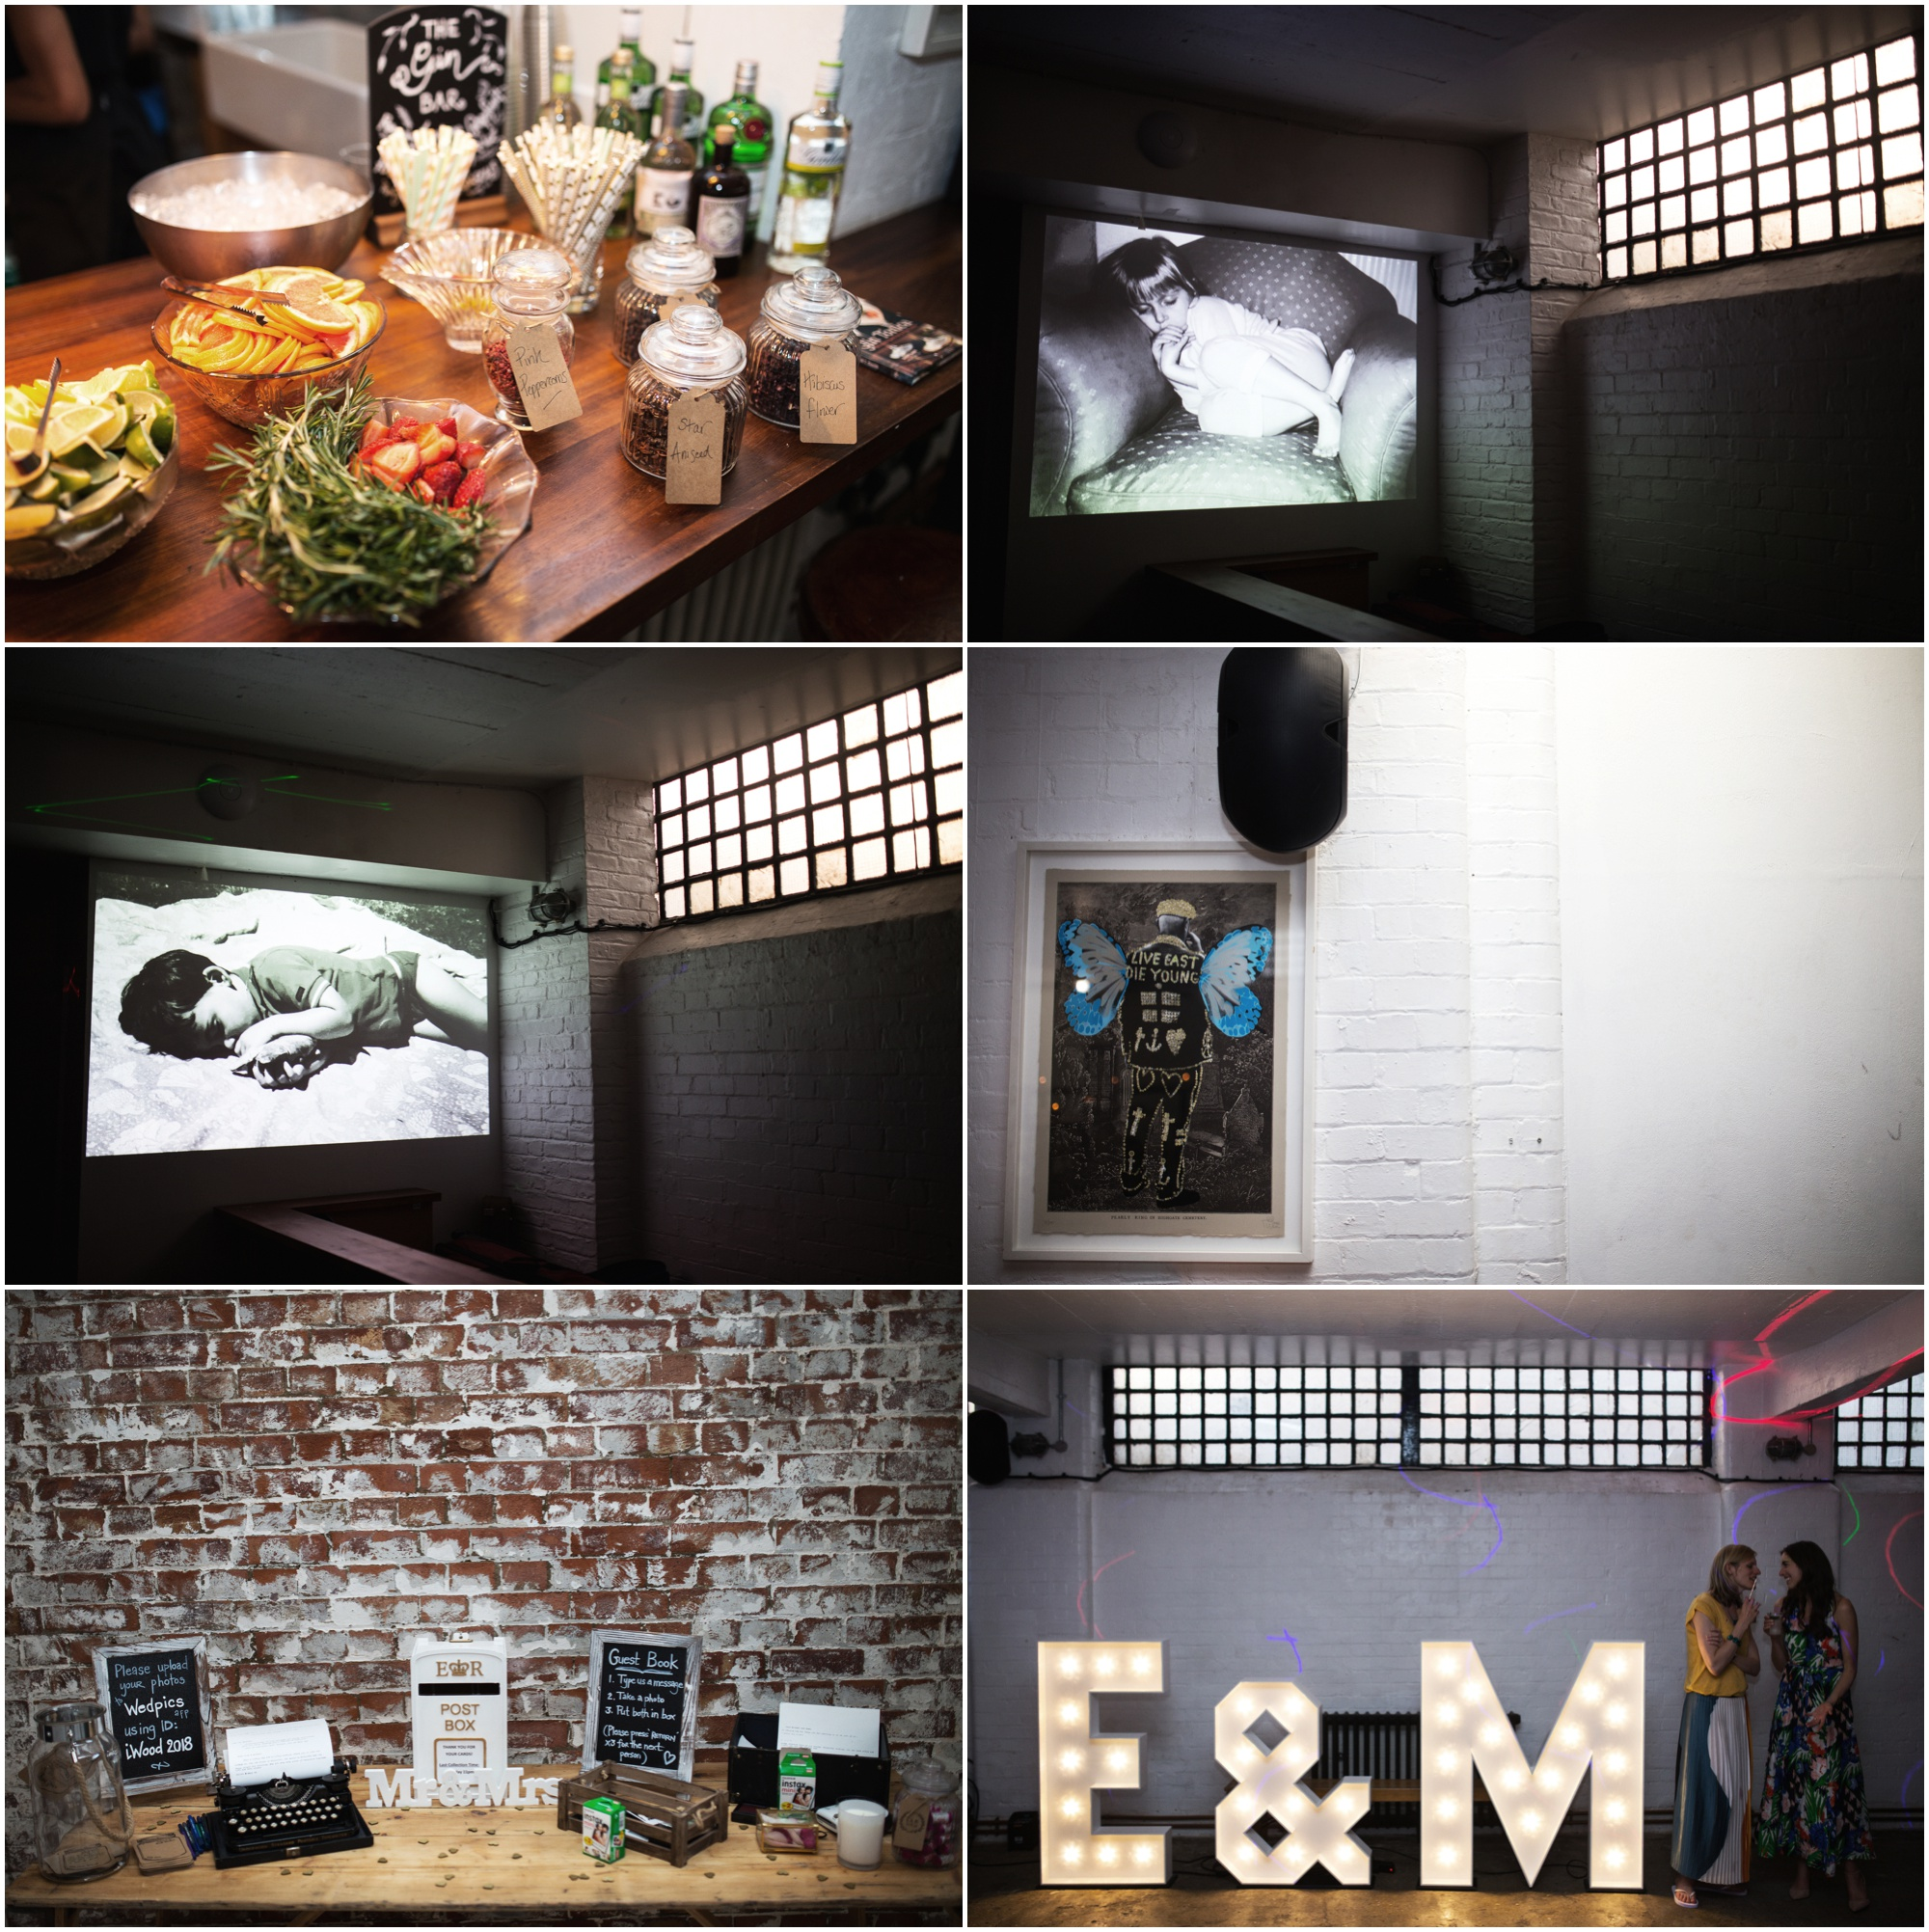 E&M_0217.jpg